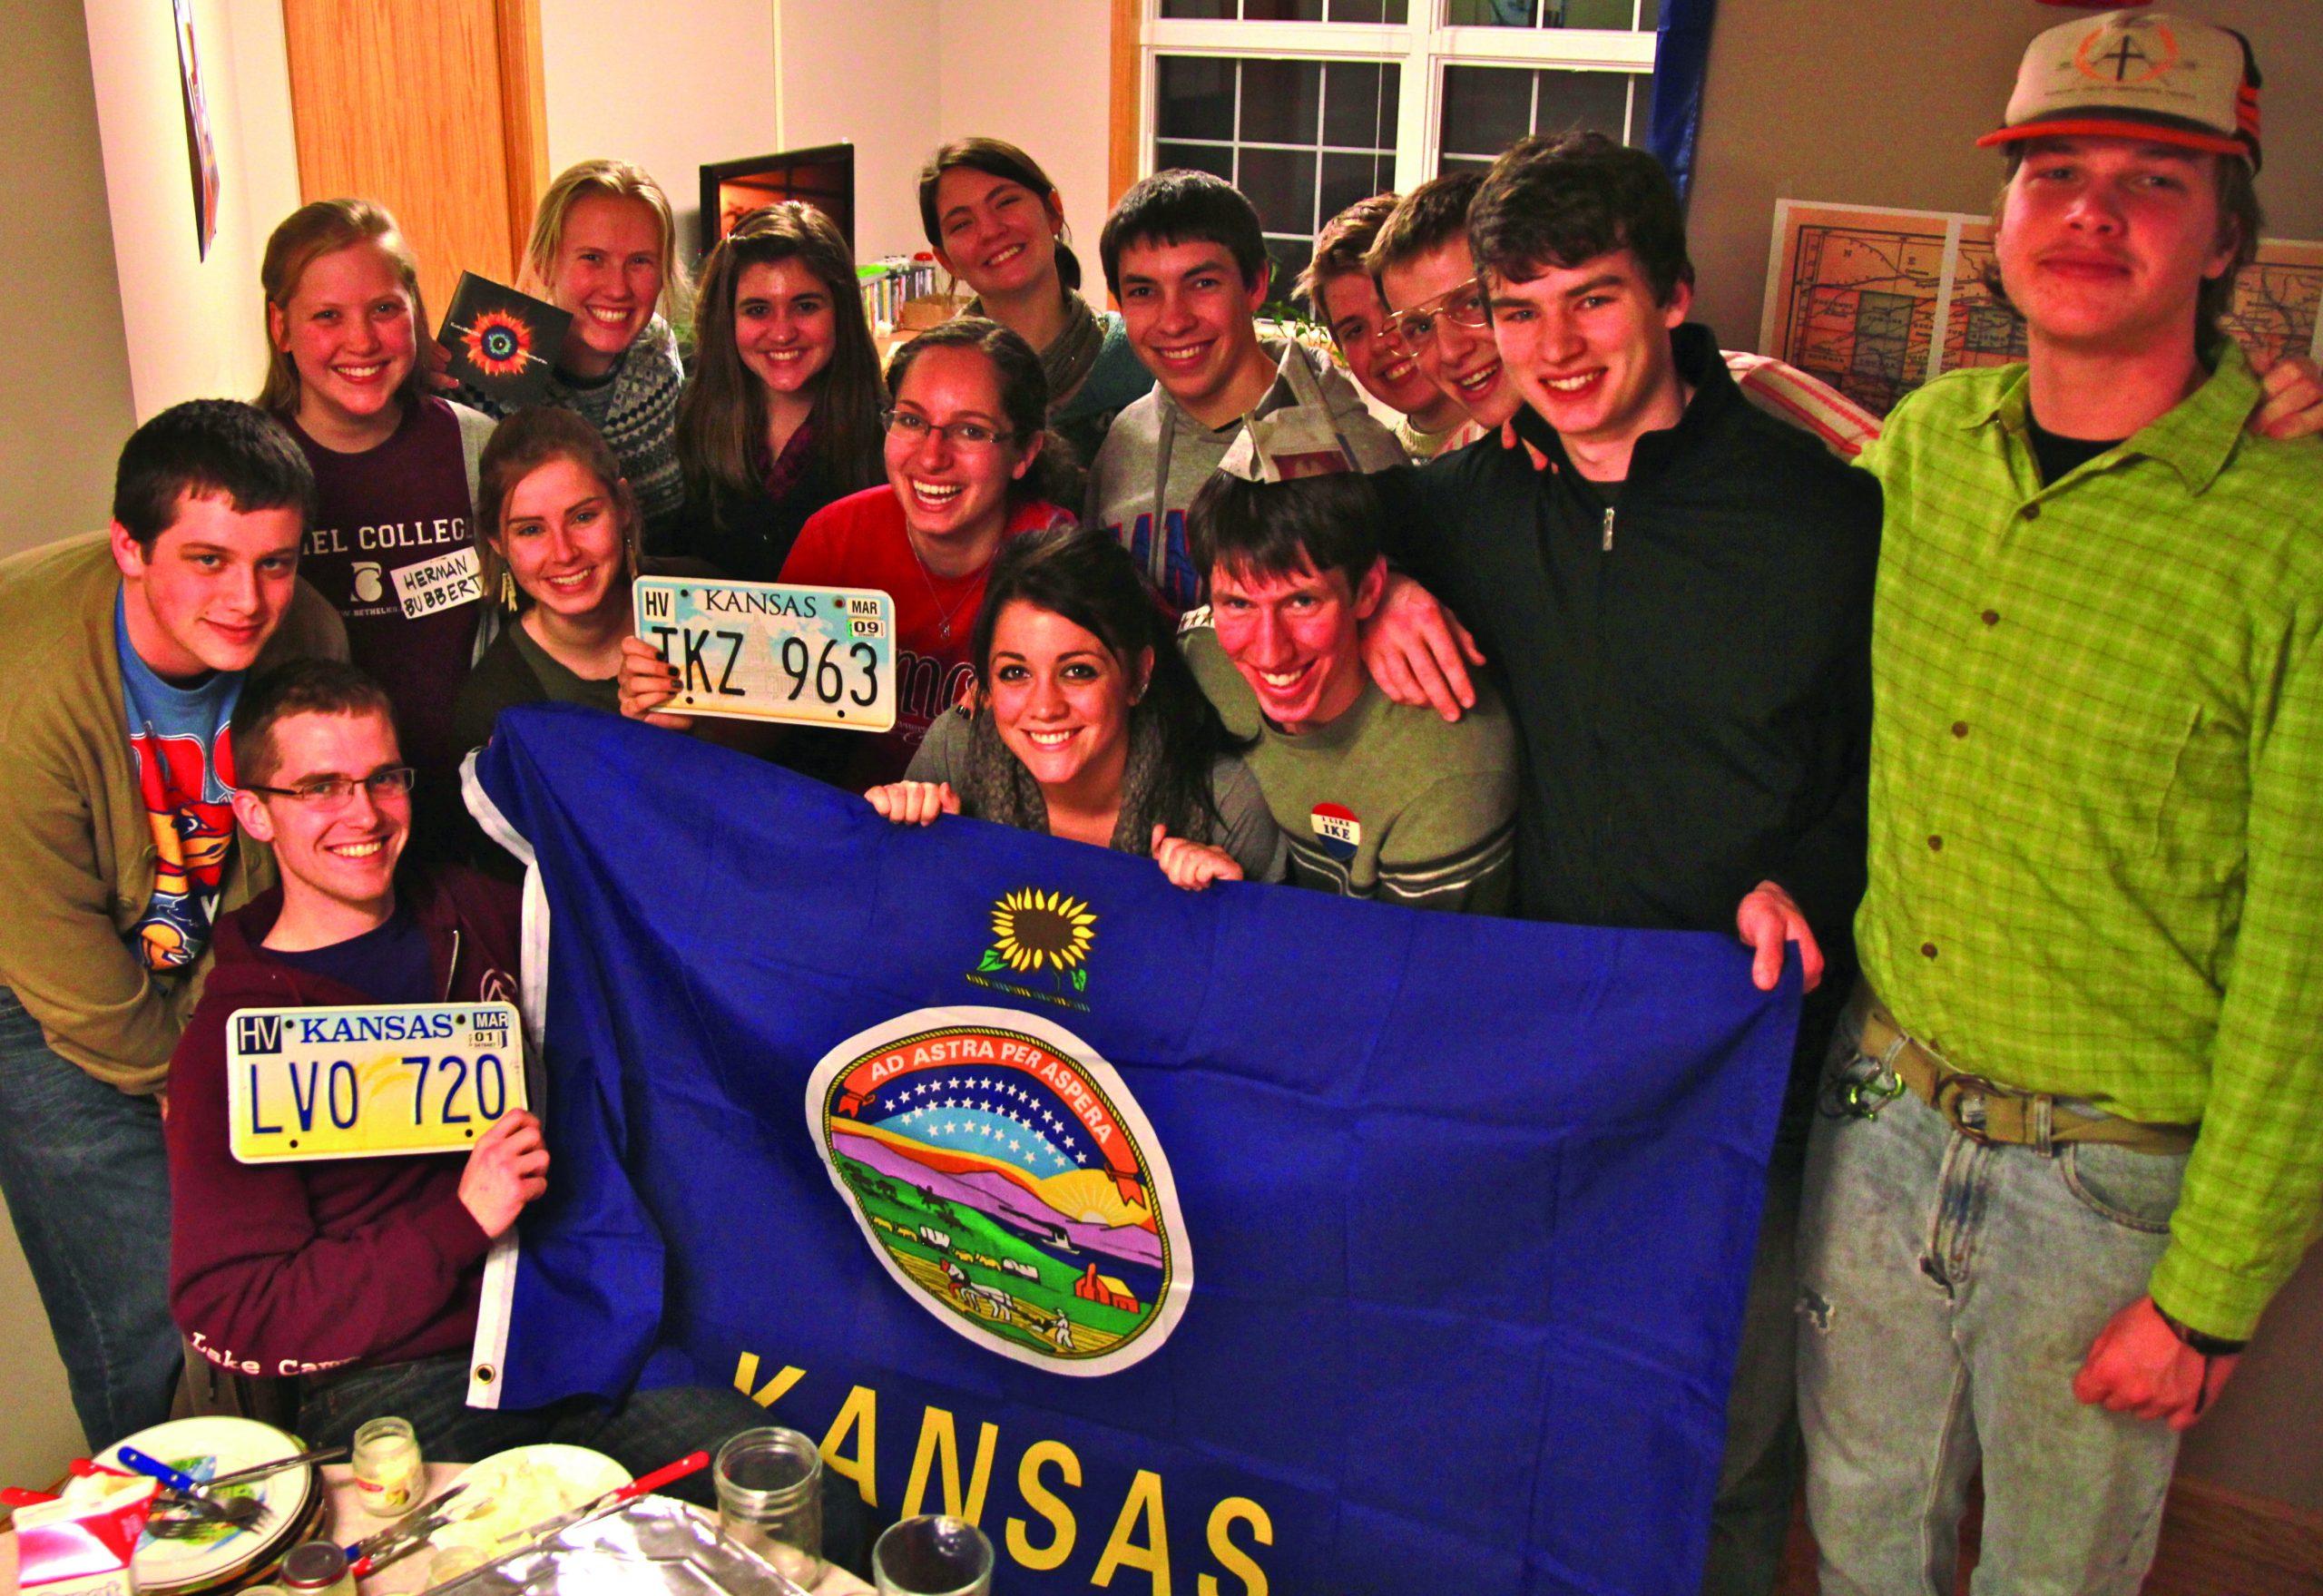 Members of Kansas Club hold up Kansas license plates and the Kansas flag